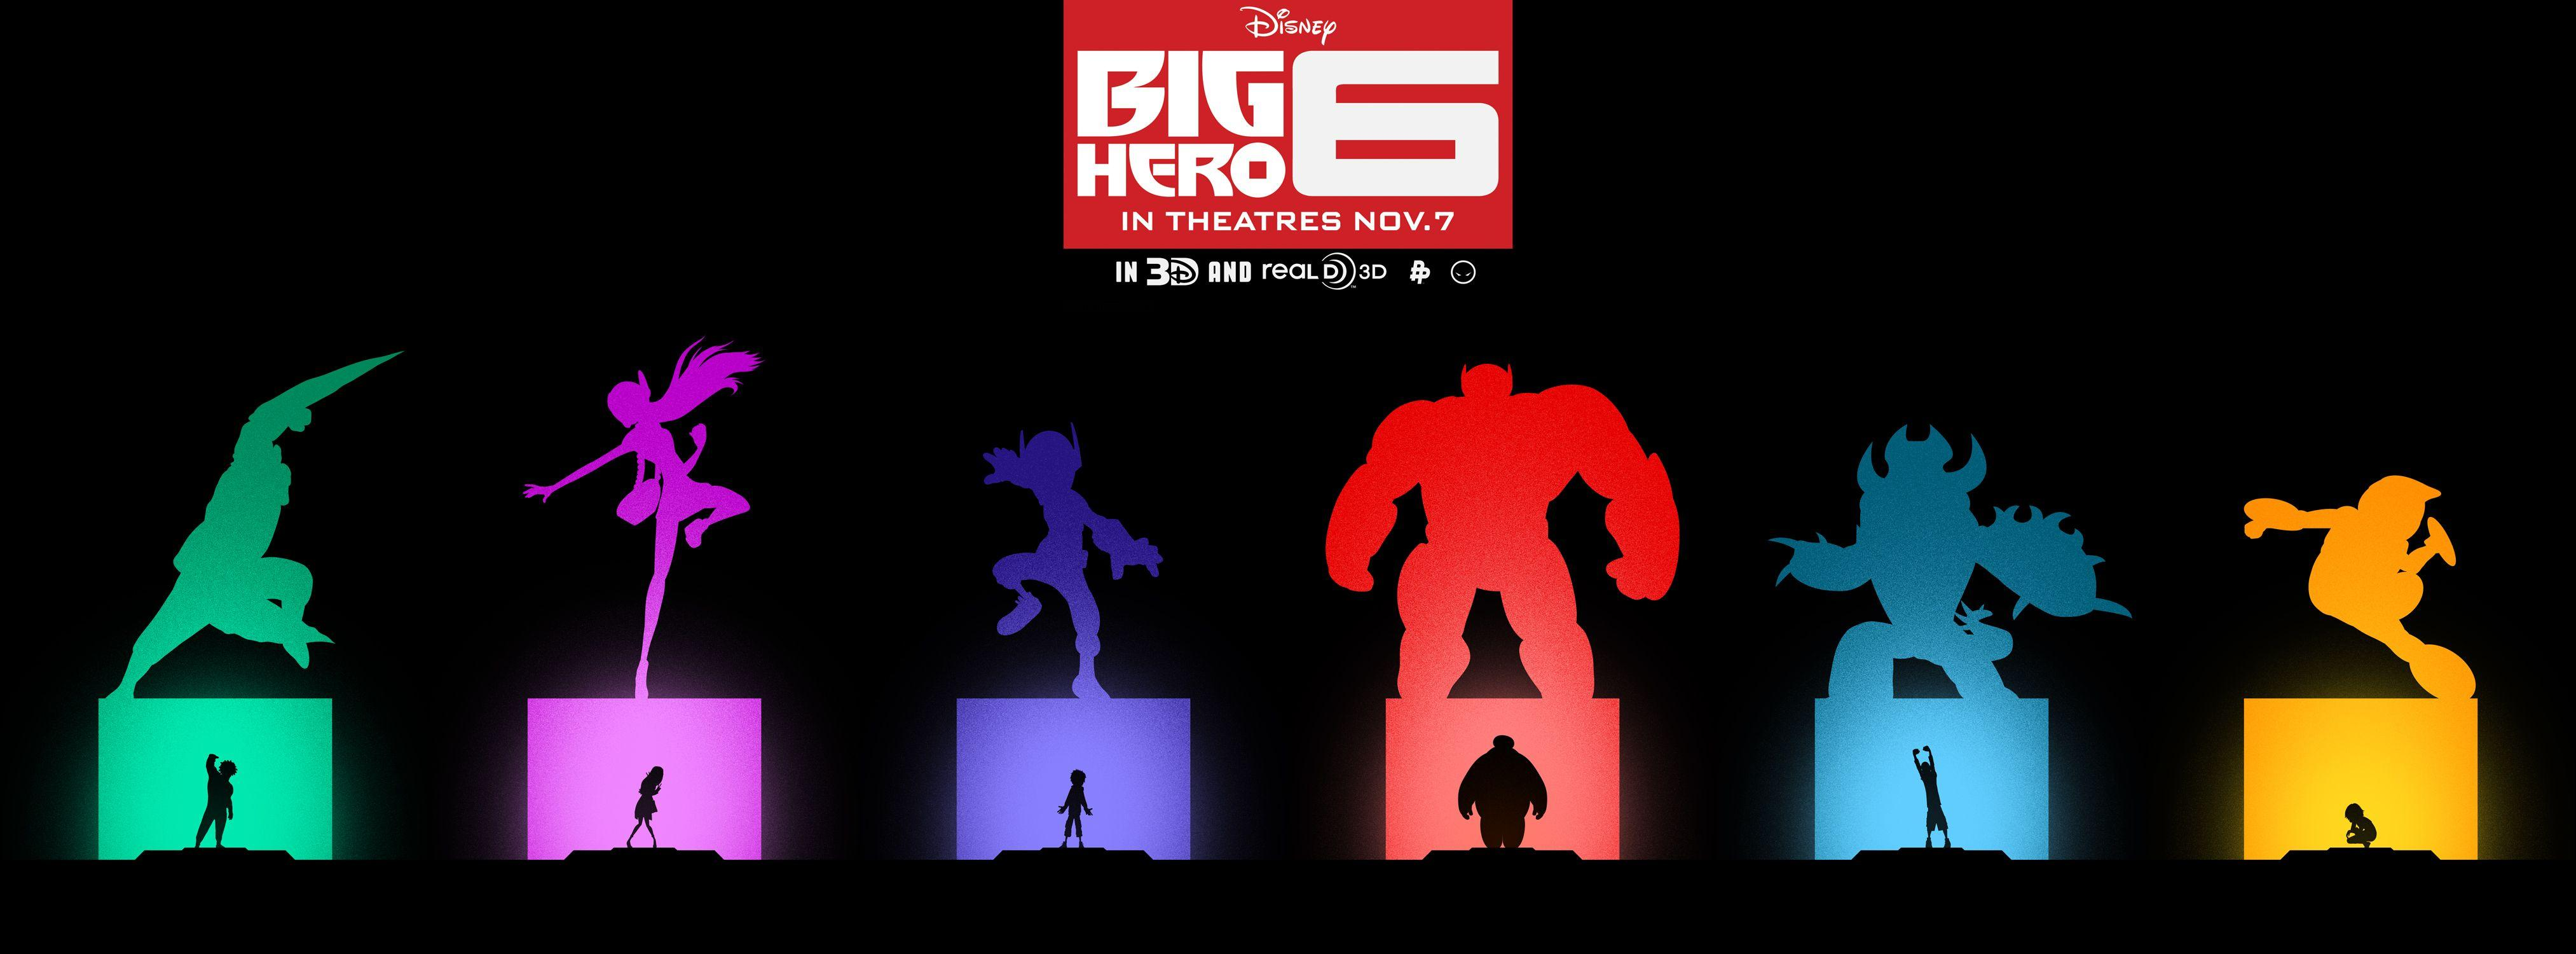 Big Hero 6 Wallpapers - Wallpaper Cave